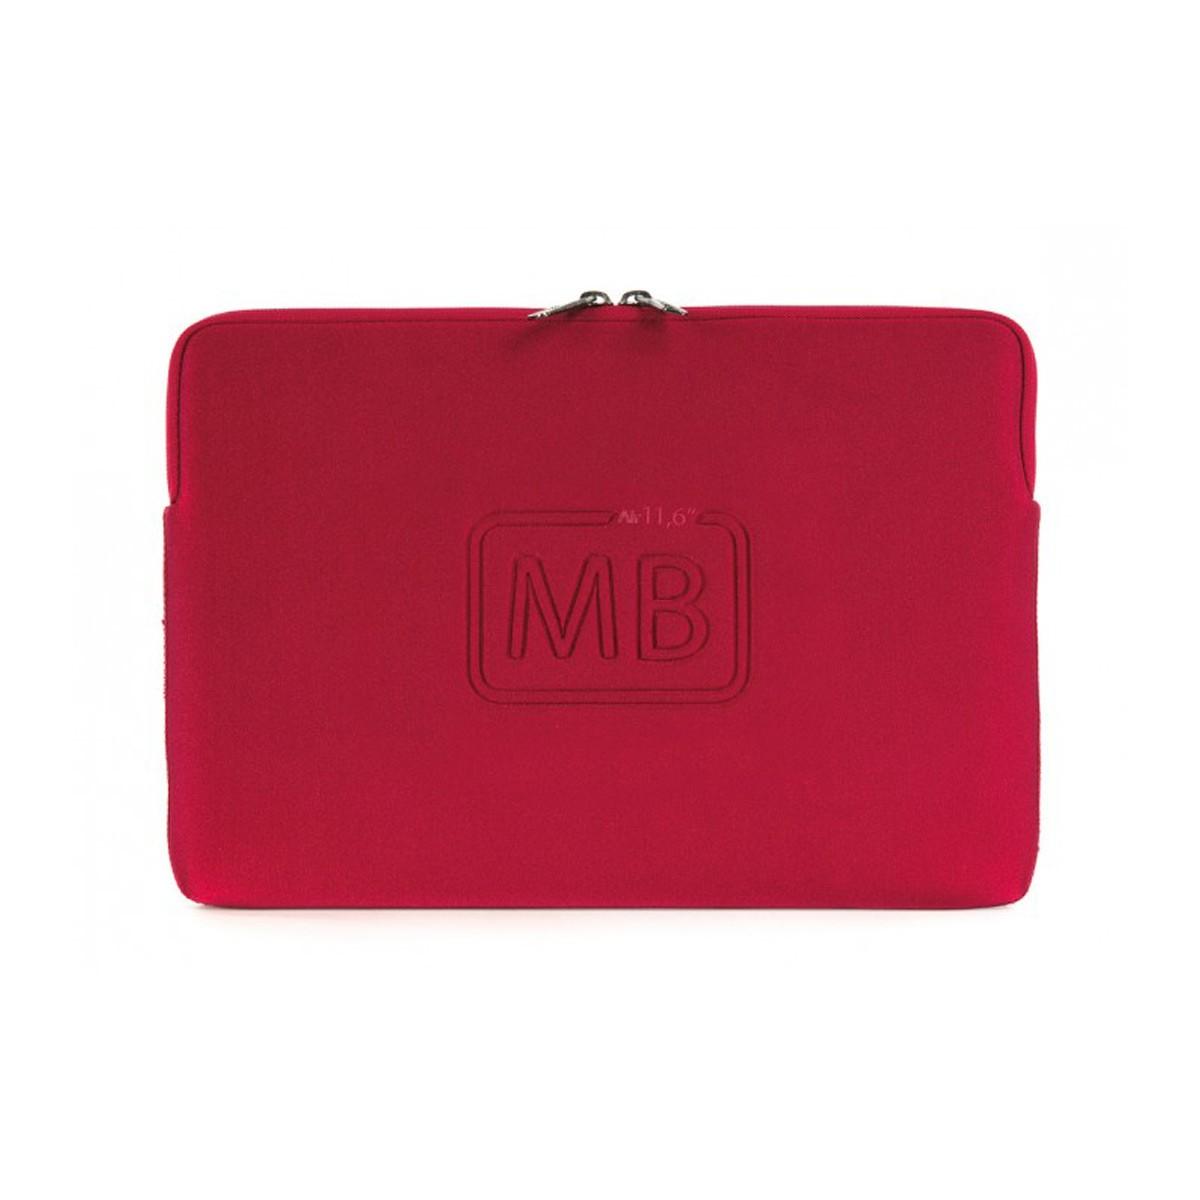 "Obal pro MacBook Air 11"" Tucano New Elements, neoprenový - červený"